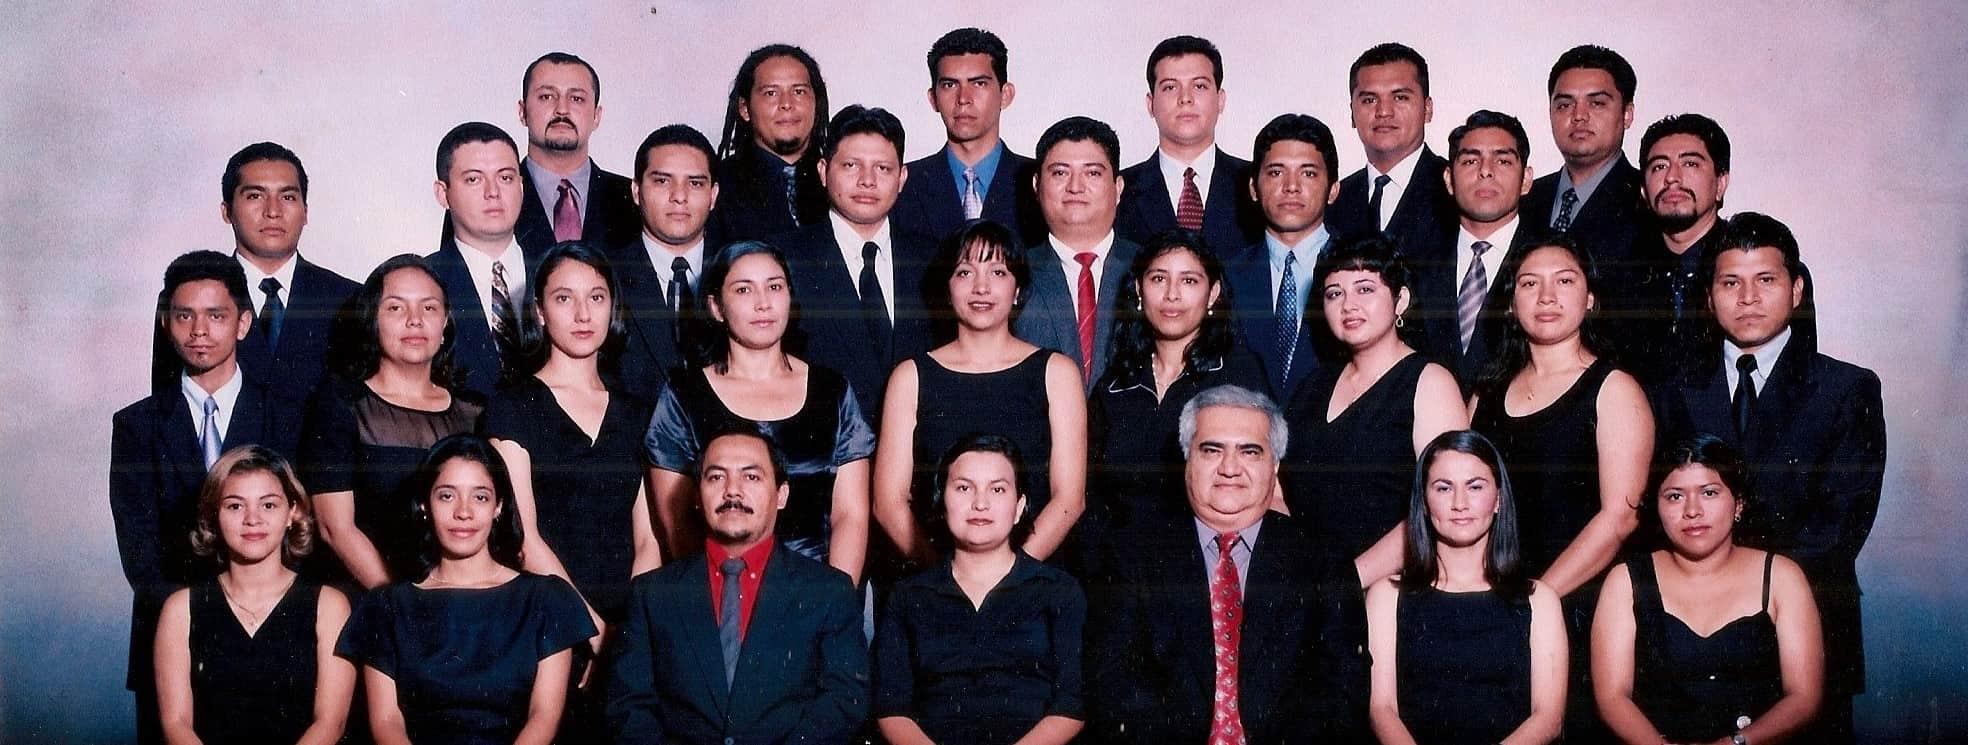 Egresados_2002